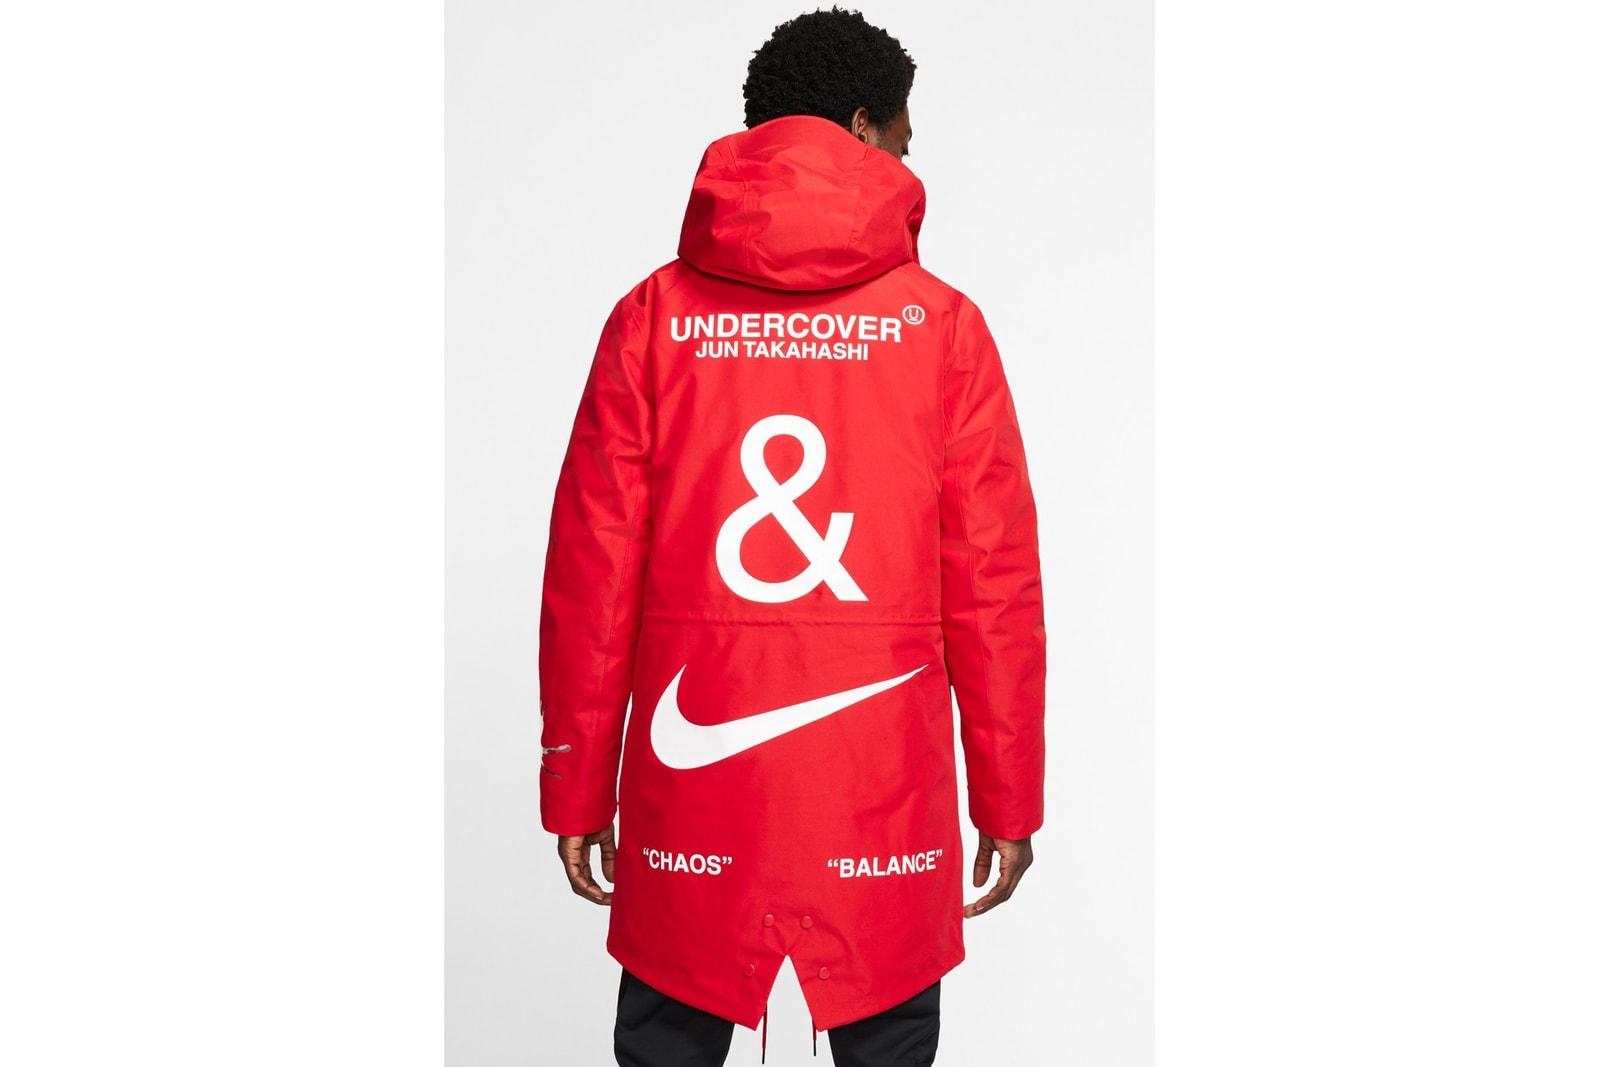 UNDERCOVER x Nike 正式發佈 2019 秋冬季度聯乘系列